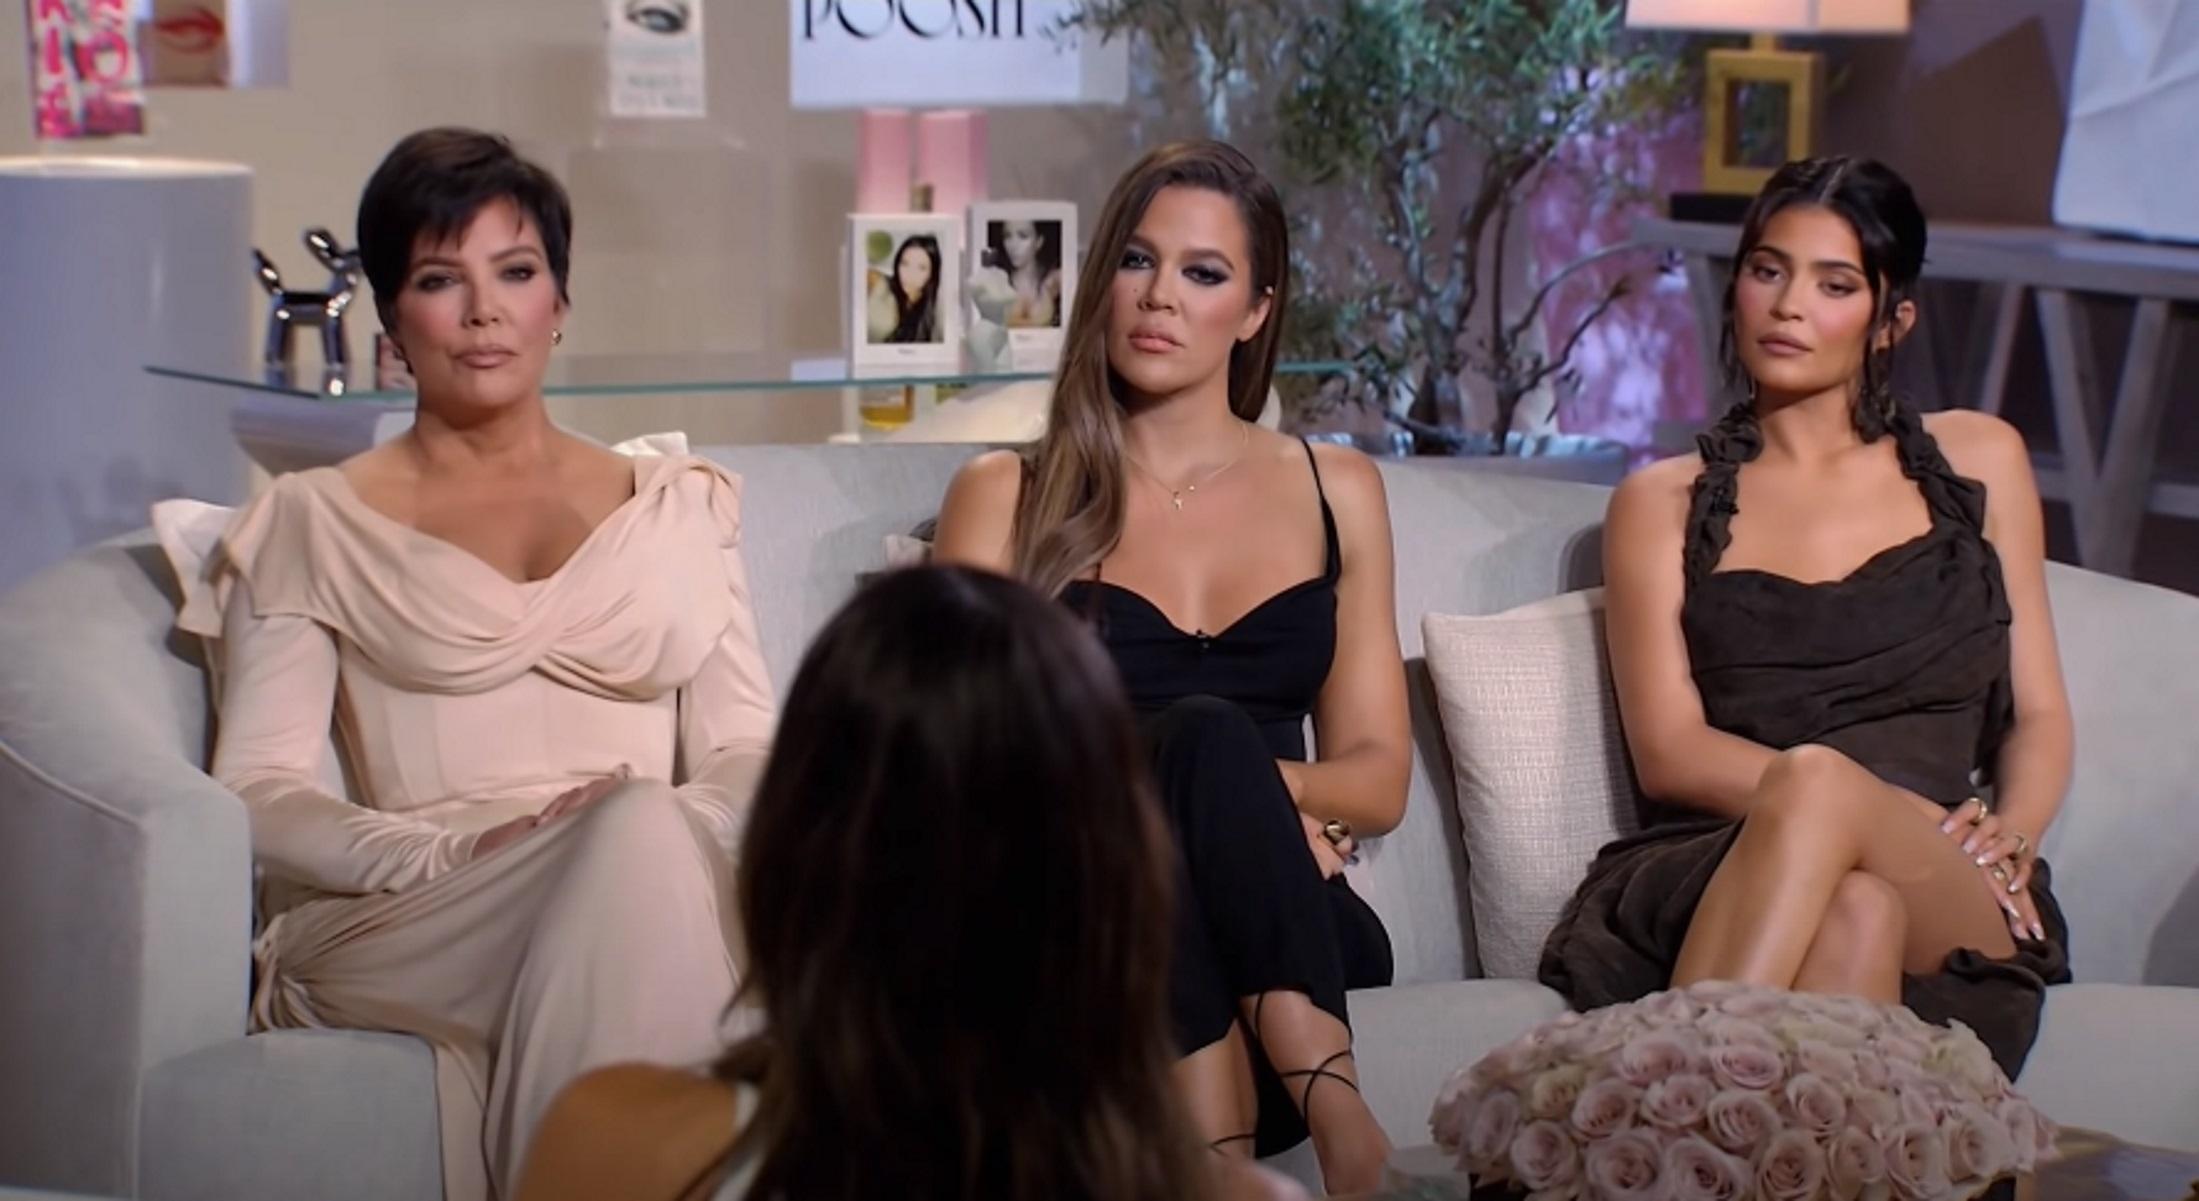 FF Group: Από τη Σόφια ξεκινά η ανάπτυξη της αλυσίδας ρούχων Kendall + Kylie στην Ευρώπη